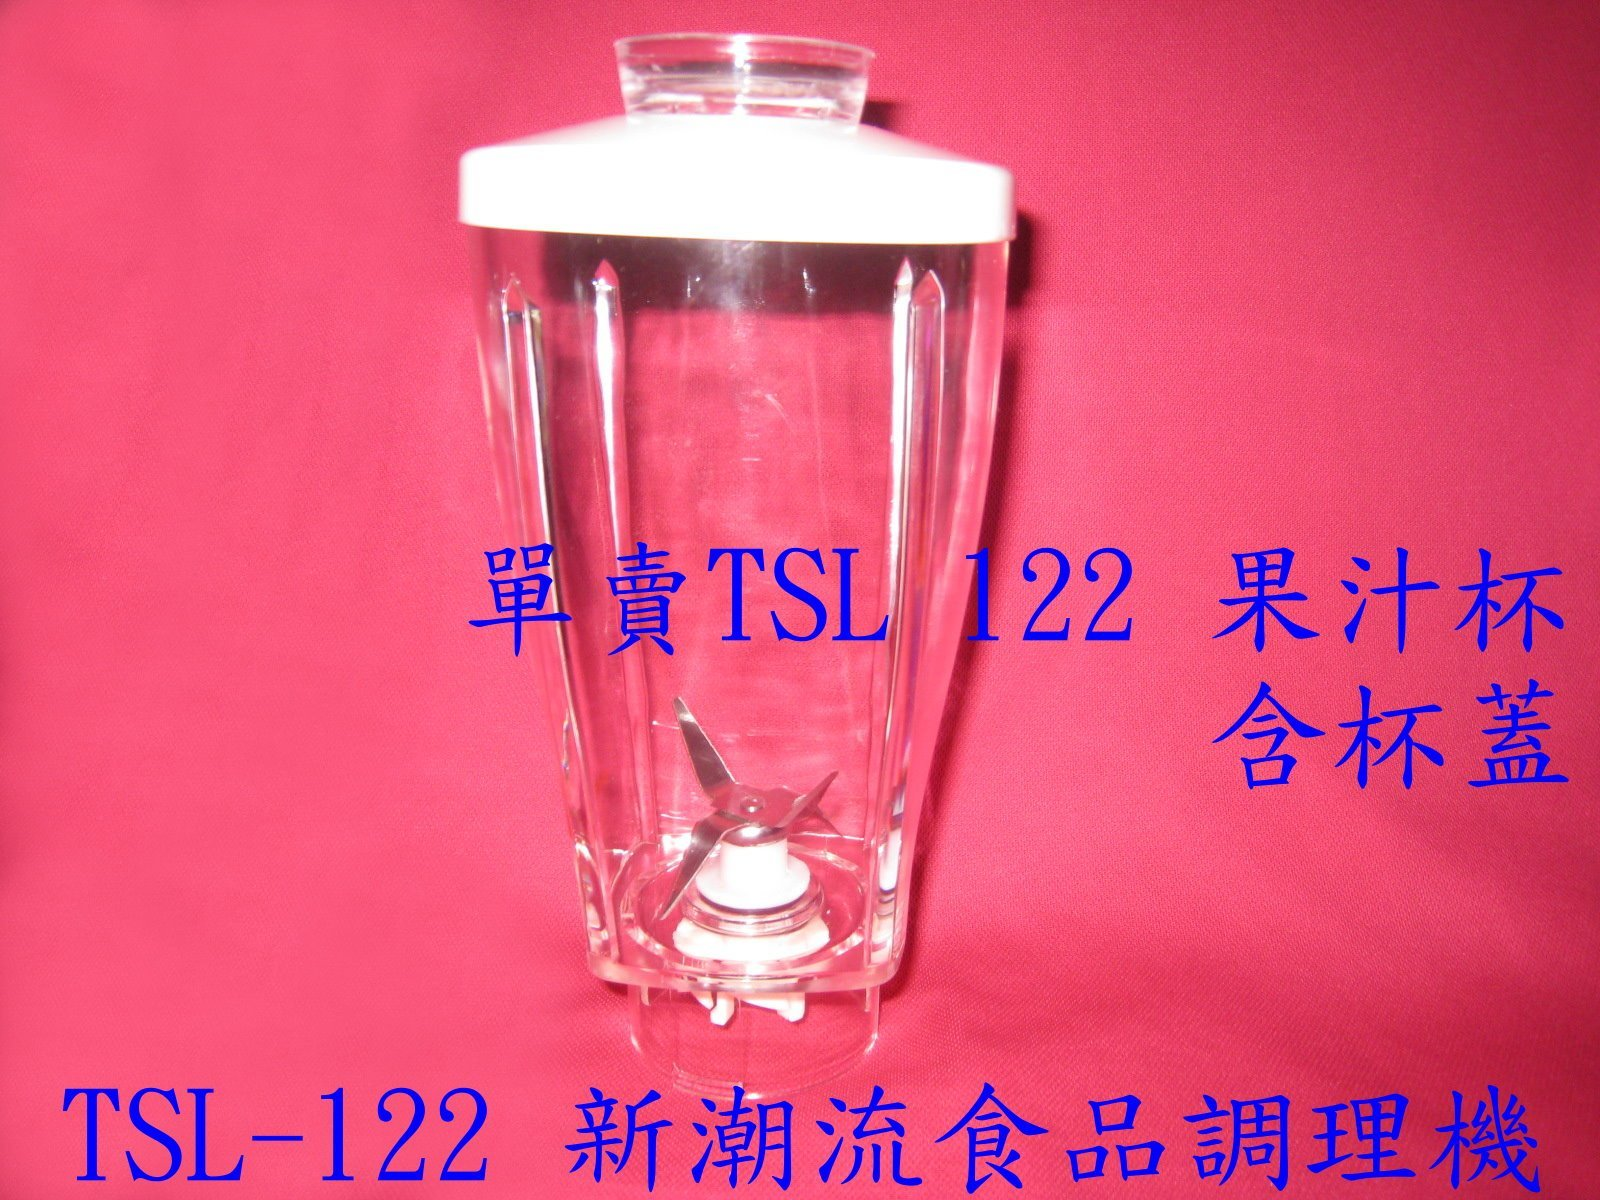 a 強力款TSL-122 新潮流食品調理機 果汁機 果菜機. 單賣TSL 122 果汁杯含杯蓋